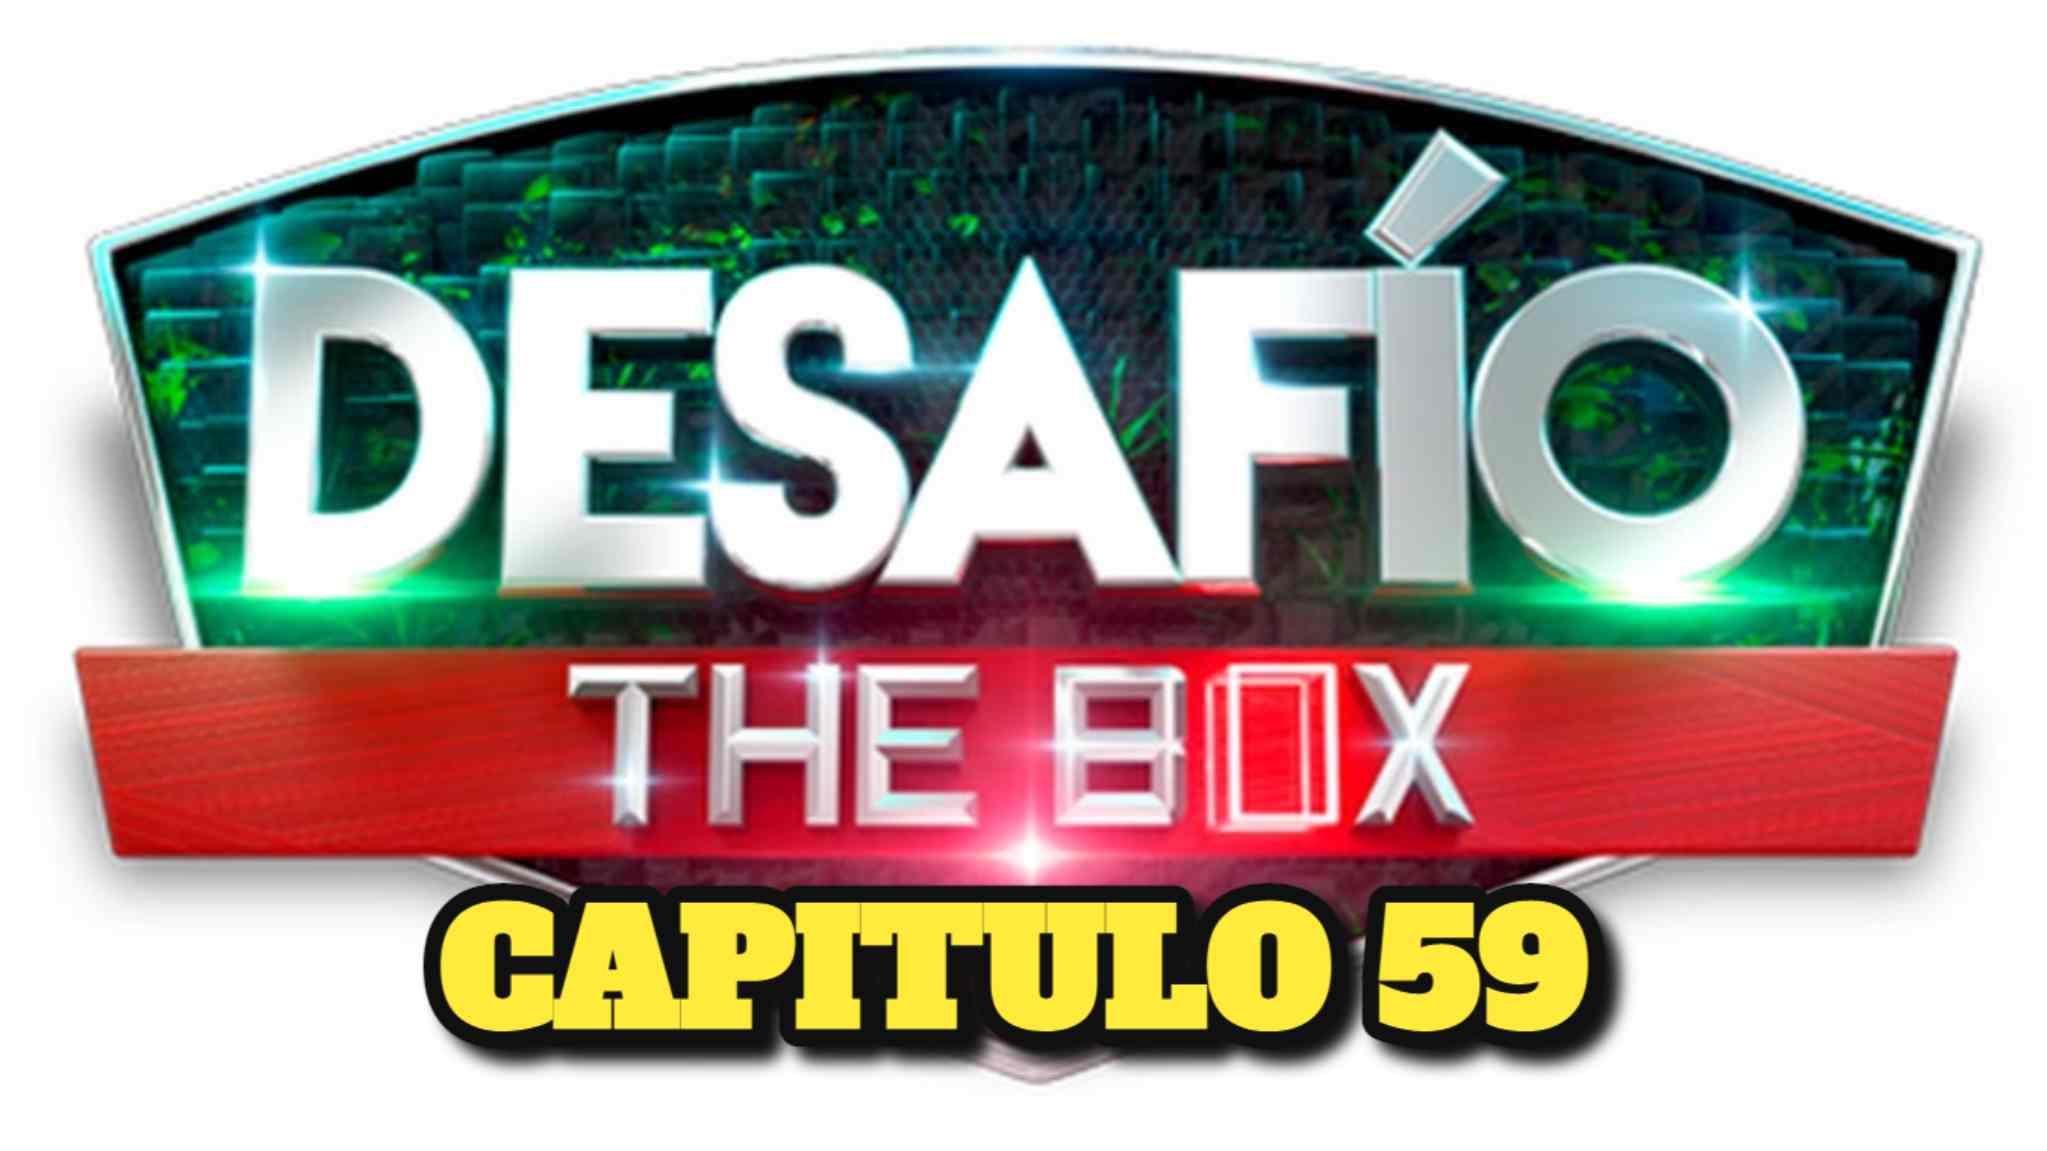 VER: EN VIVO, Desafio The Box 2021 CAPITULO 59; MIRAR AQUI EN VIVO desafio the box en vivo hoy